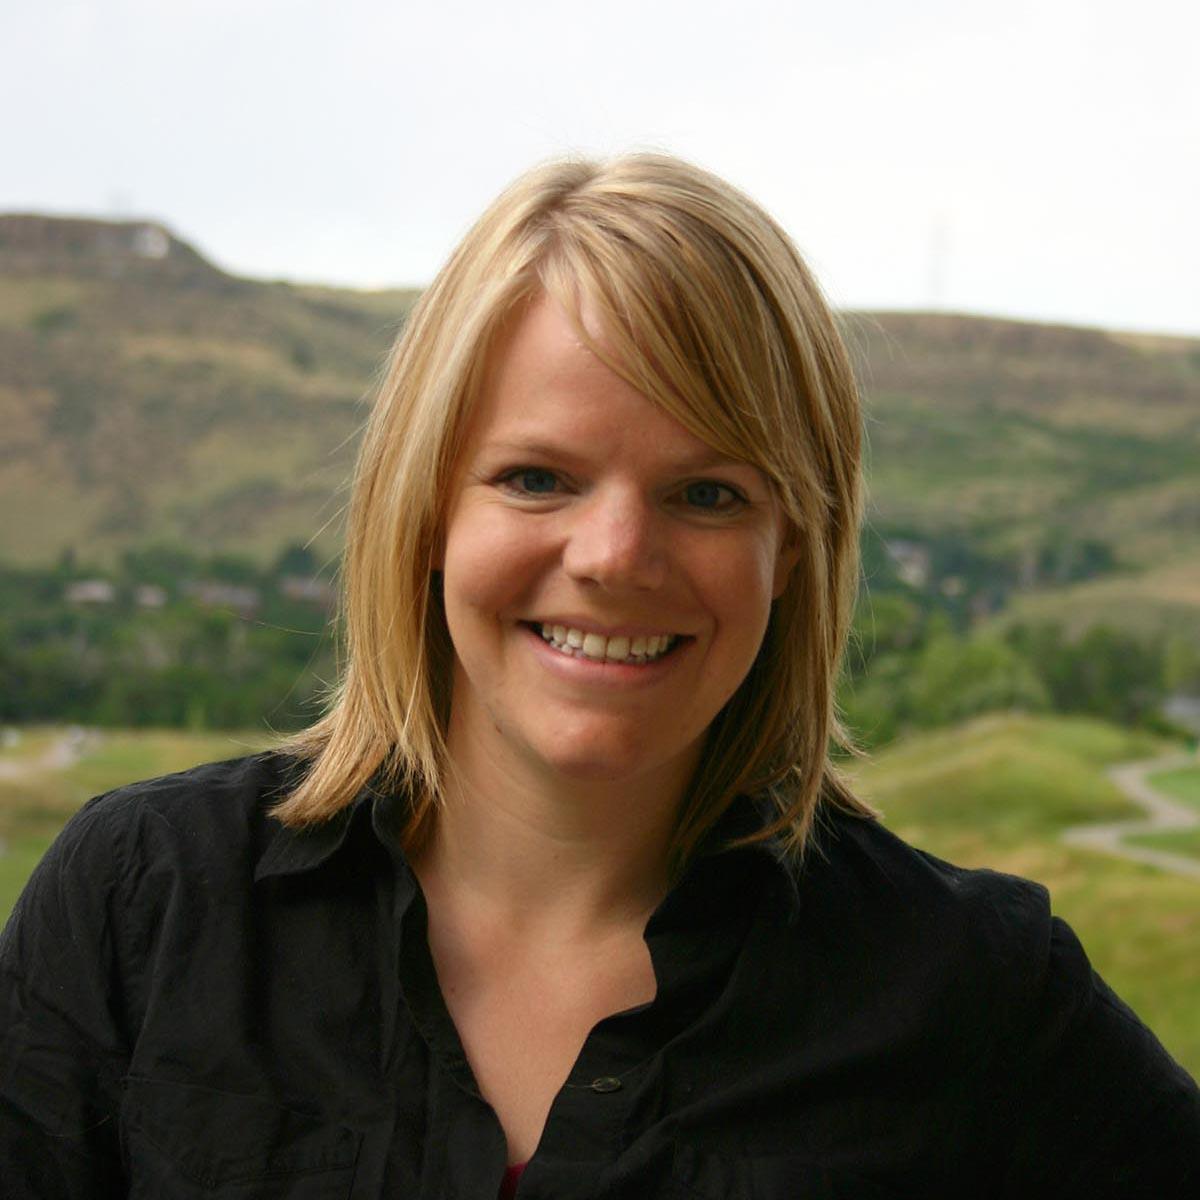 Dana Humphreys Joins Hyder as Marketing Manager   November 16, 2011